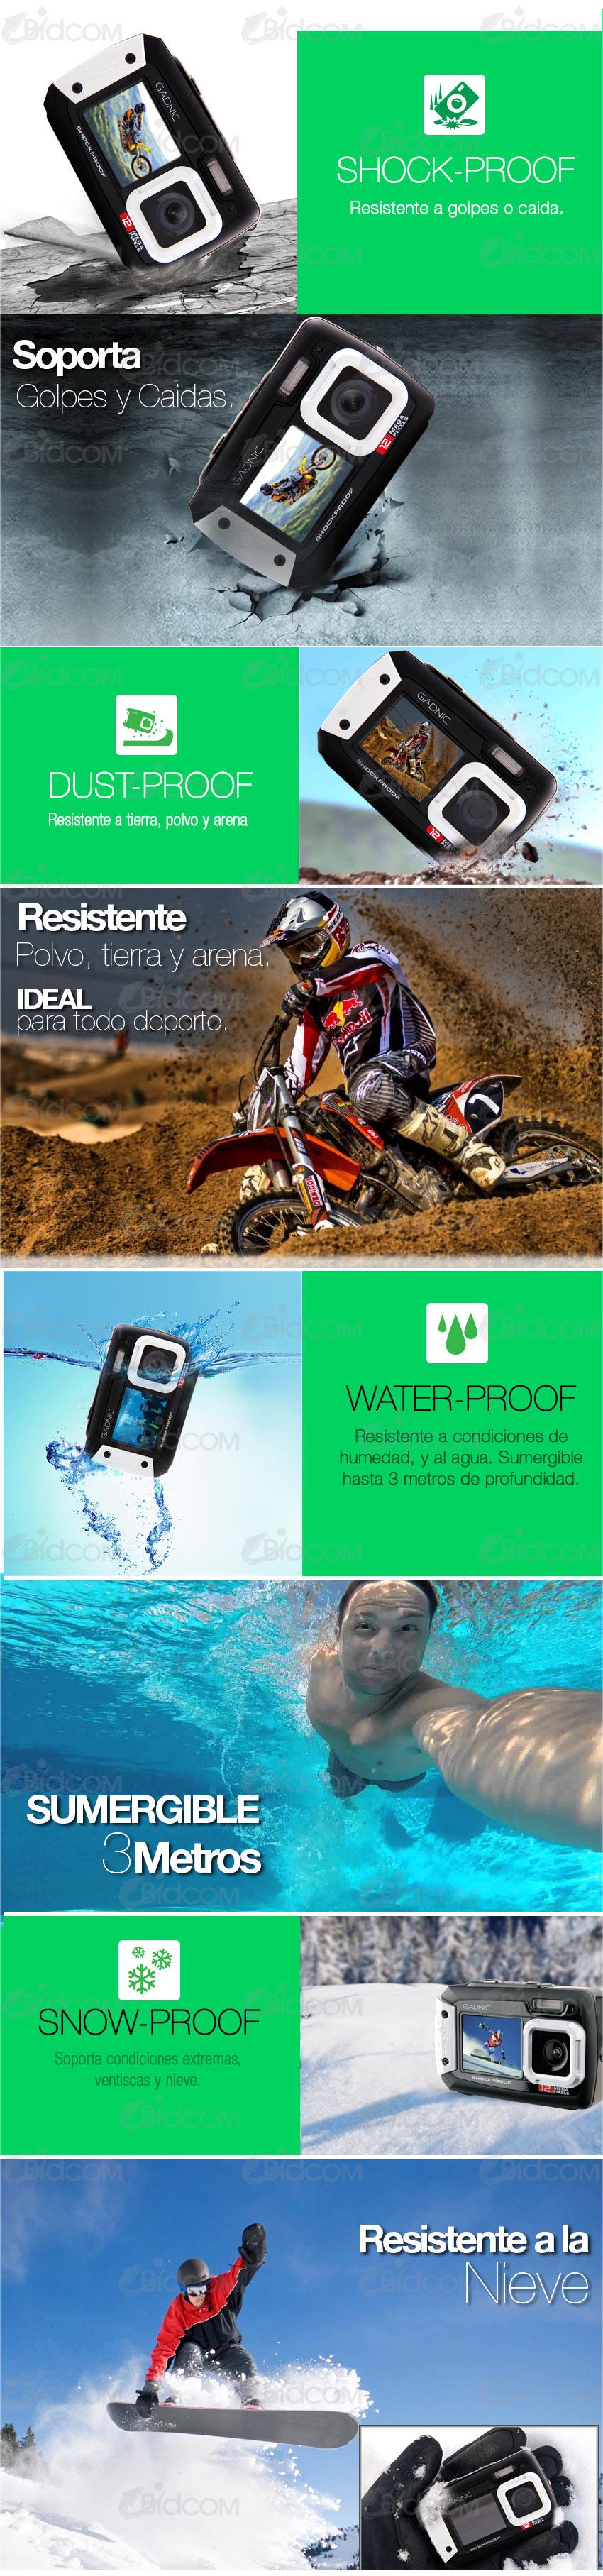 Cámara Gadnic Waterproof / Shockproof 12 Mpx